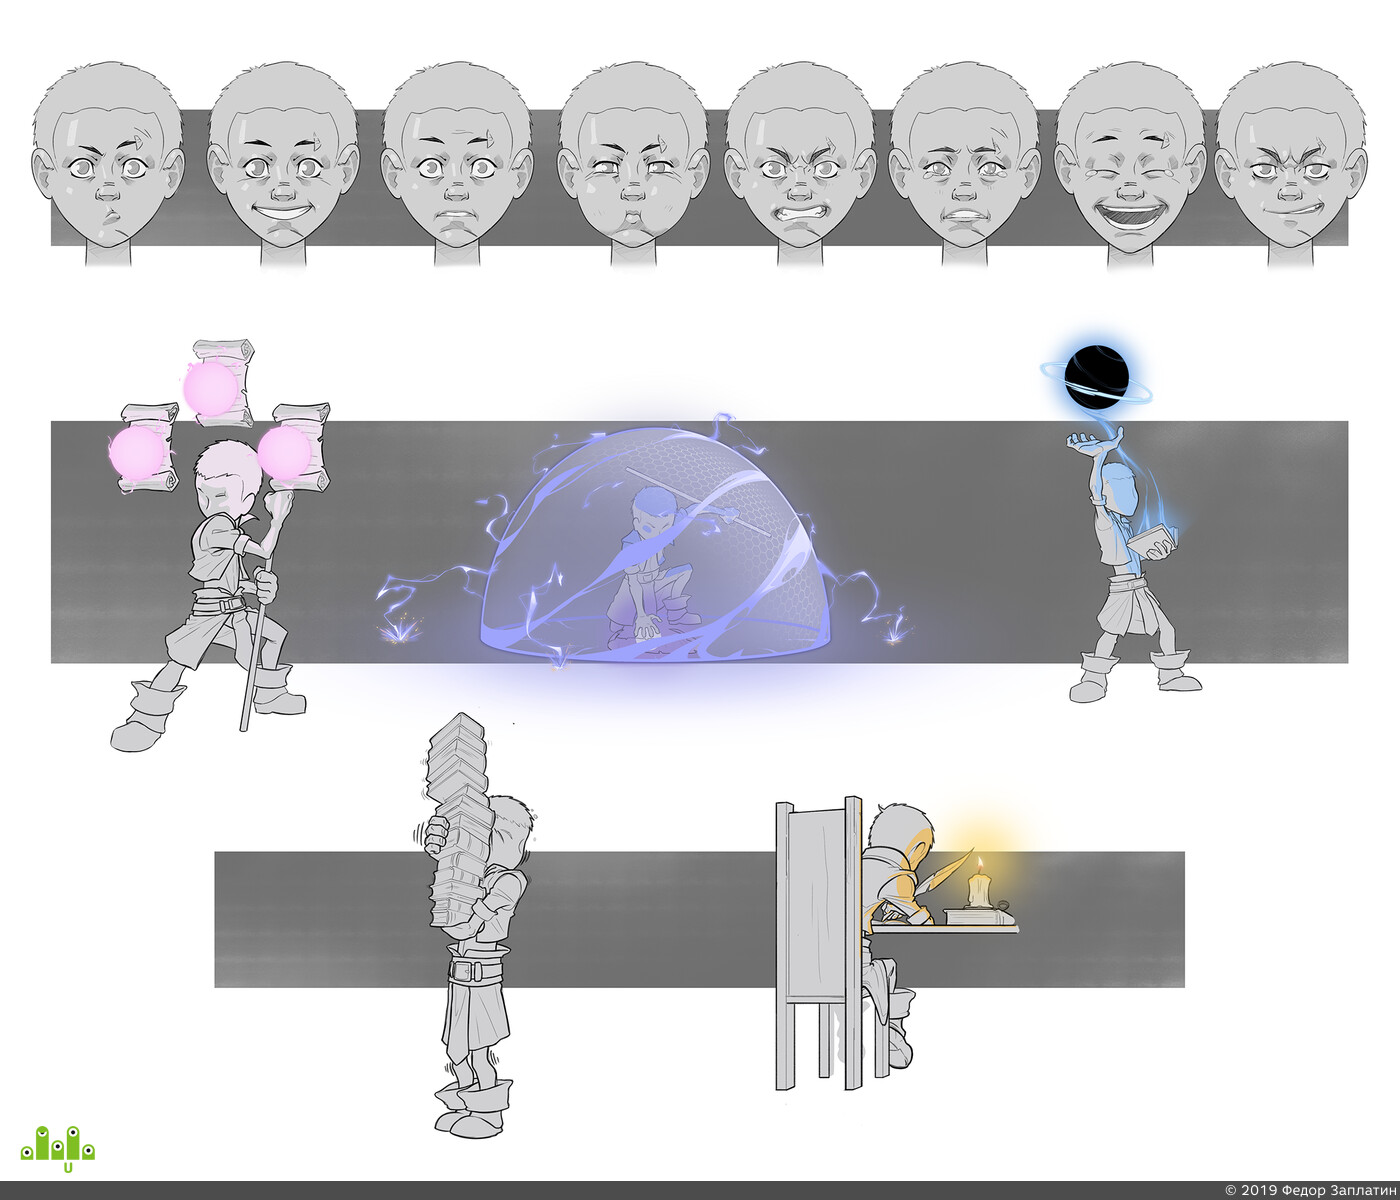 2D, 2dart, Digital 2D, 2D art, character2d, concept-art, concept, design_character, Character